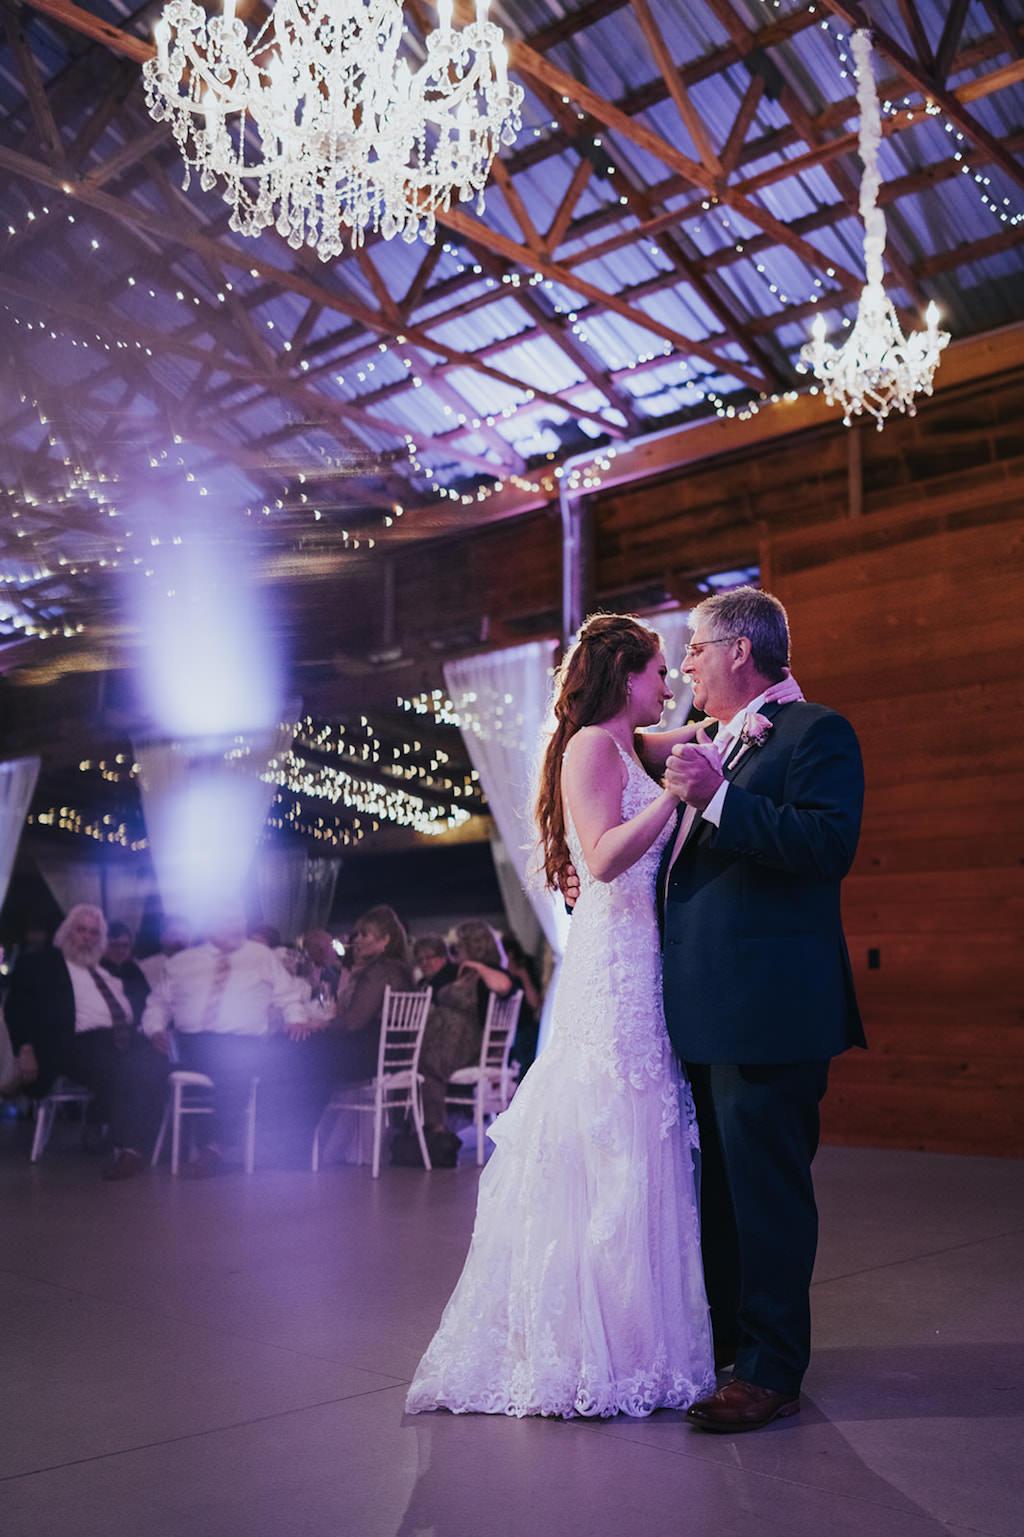 Florida Bride and Father Dance Wedding Barn Reception Portrait Under Crystal Chandeliers   Tampa Bay Wedding Venue Rafter J Ranch